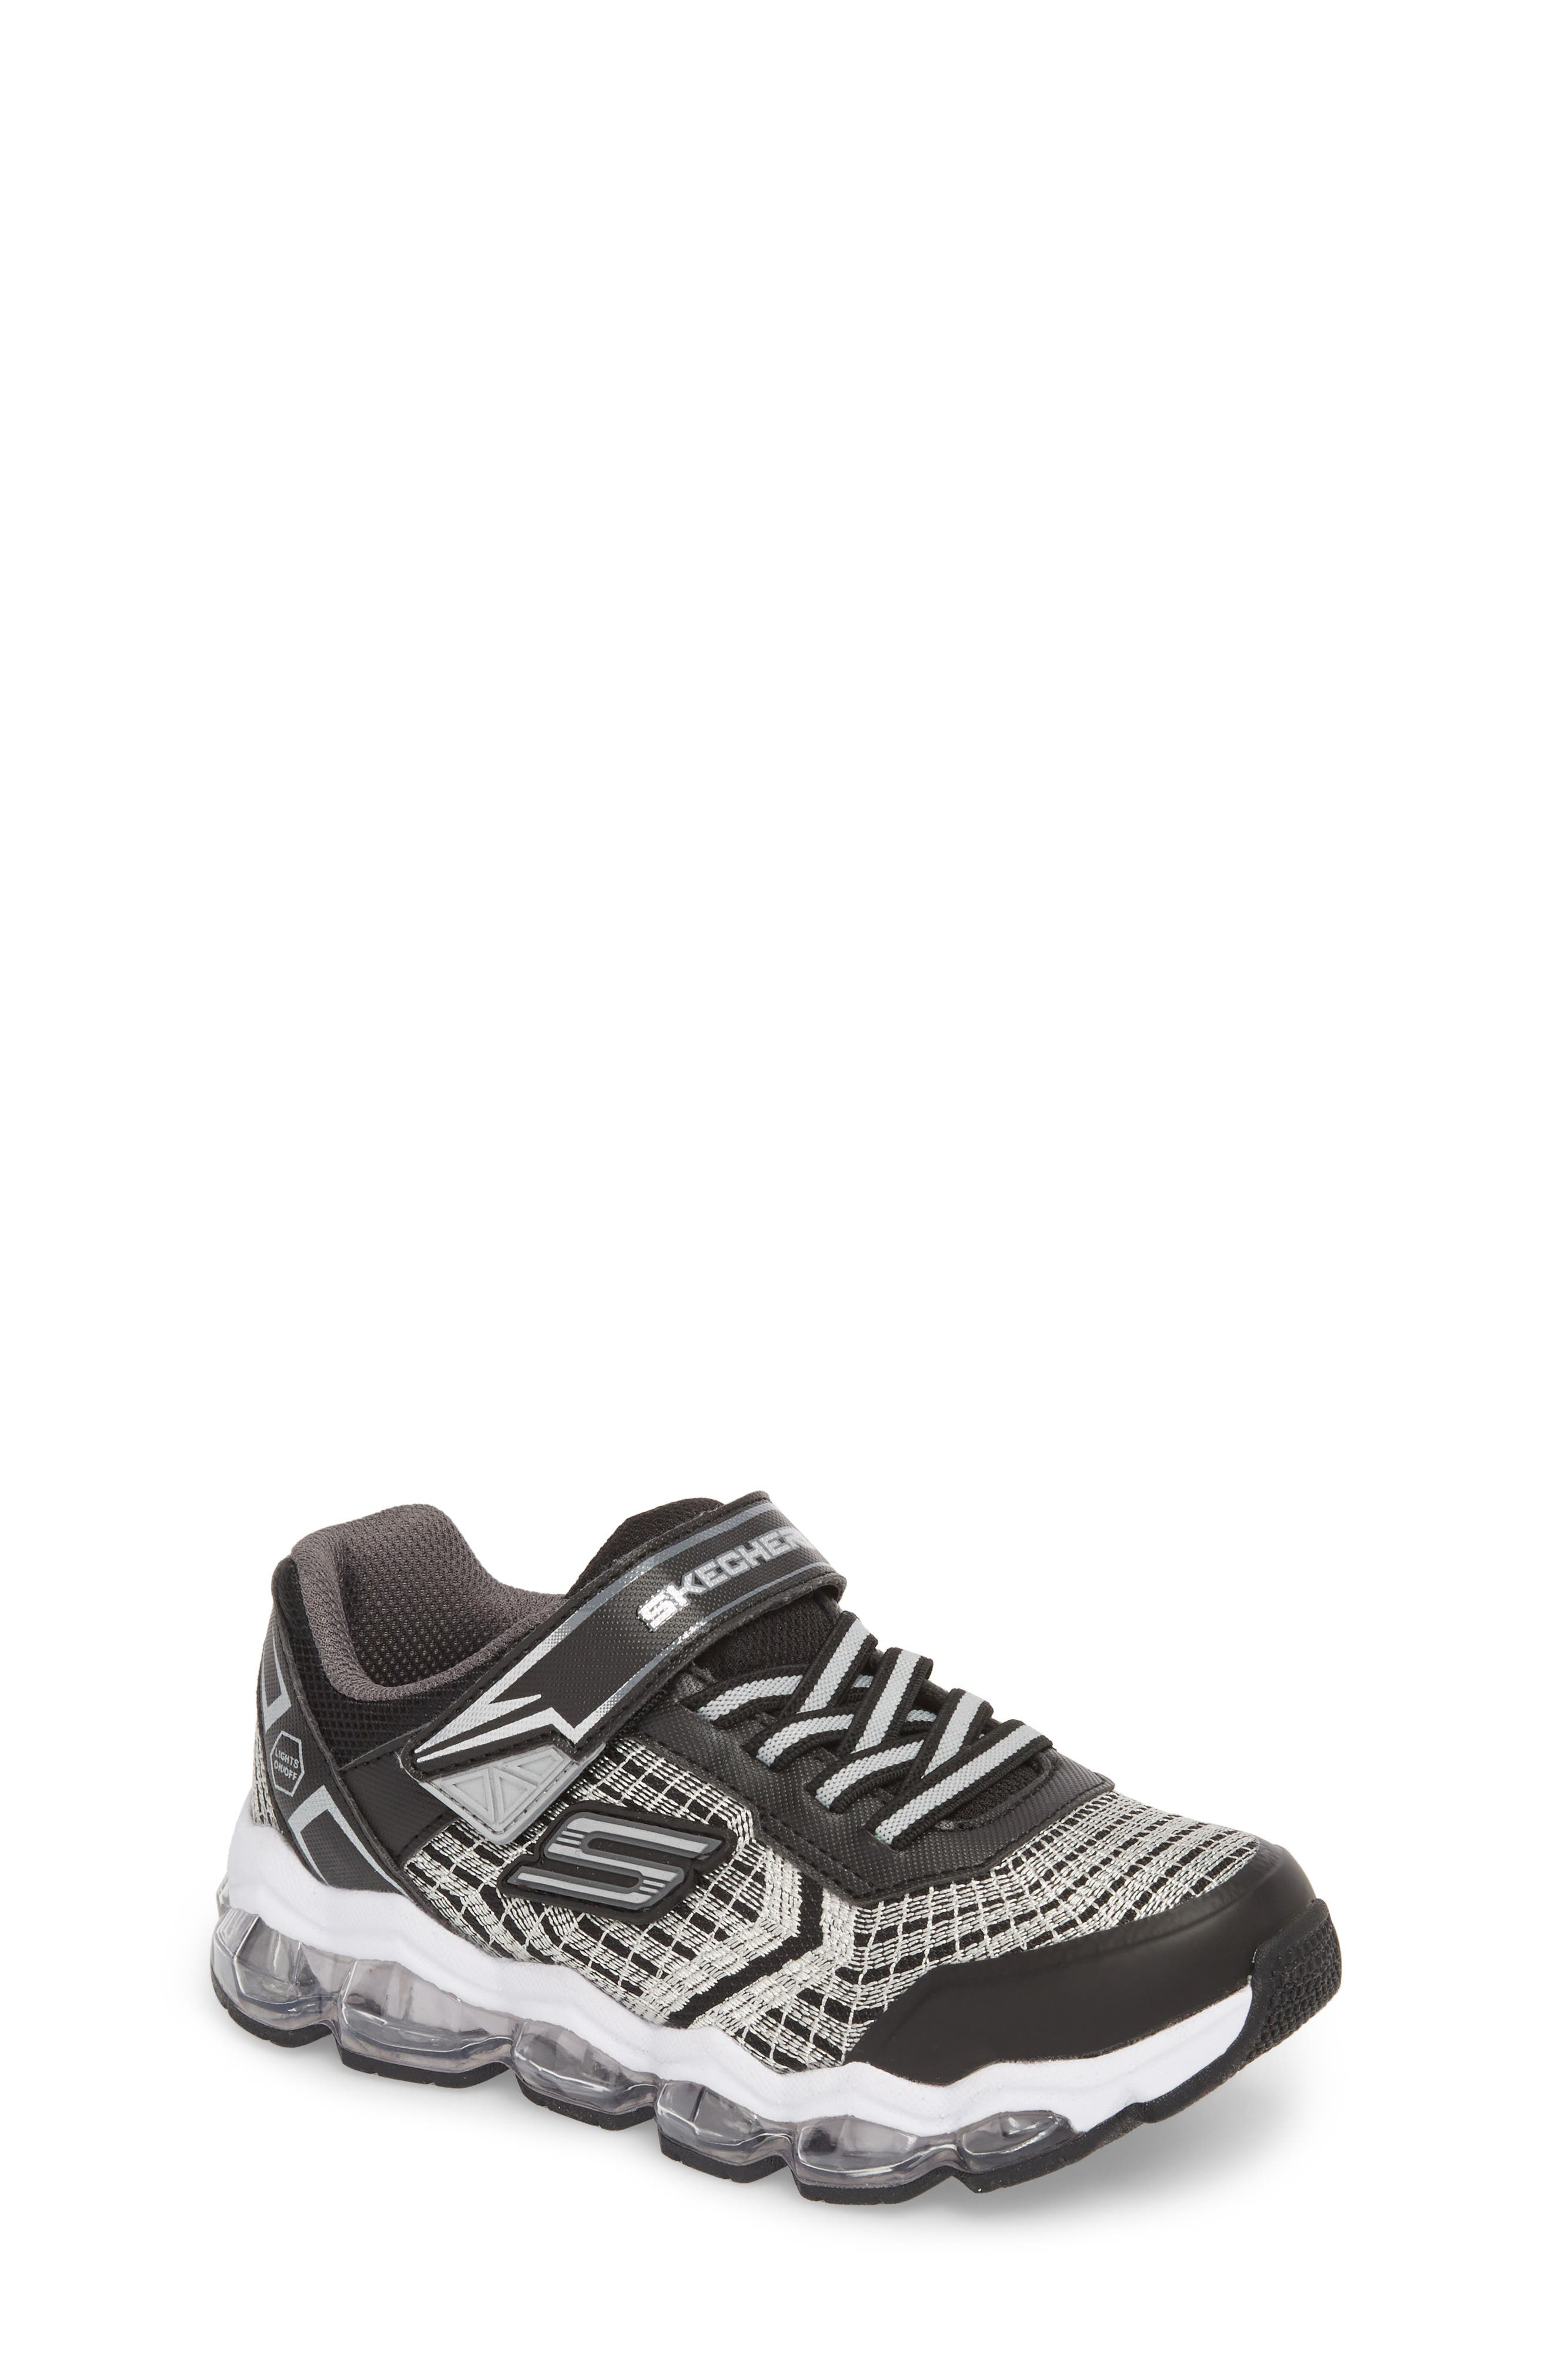 Energy Lights Sneaker,                         Main,                         color, Black/ Silver